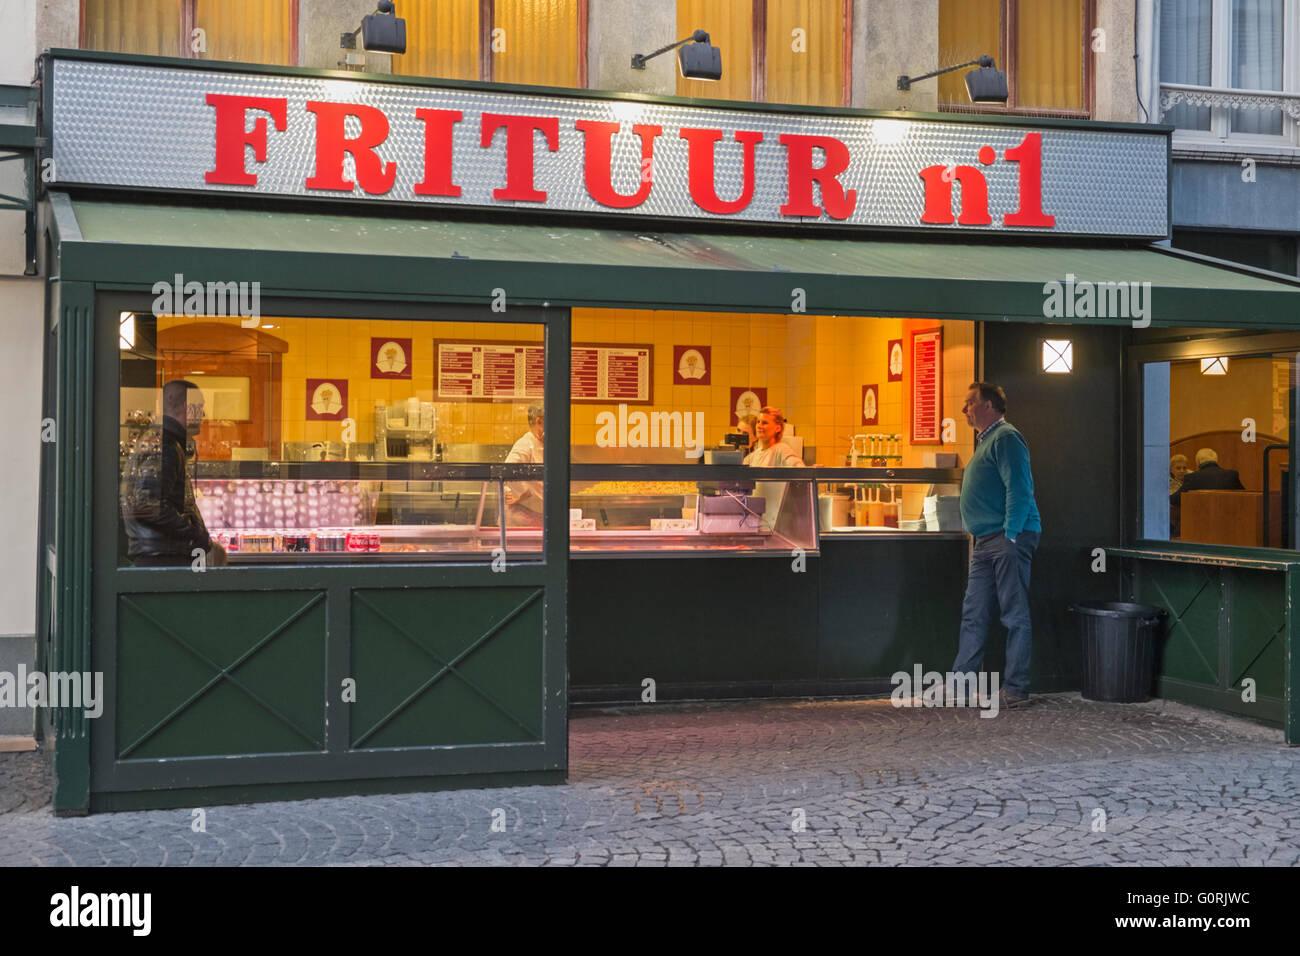 Número 1 Frituur Amberes Bélgica Imagen De Stock